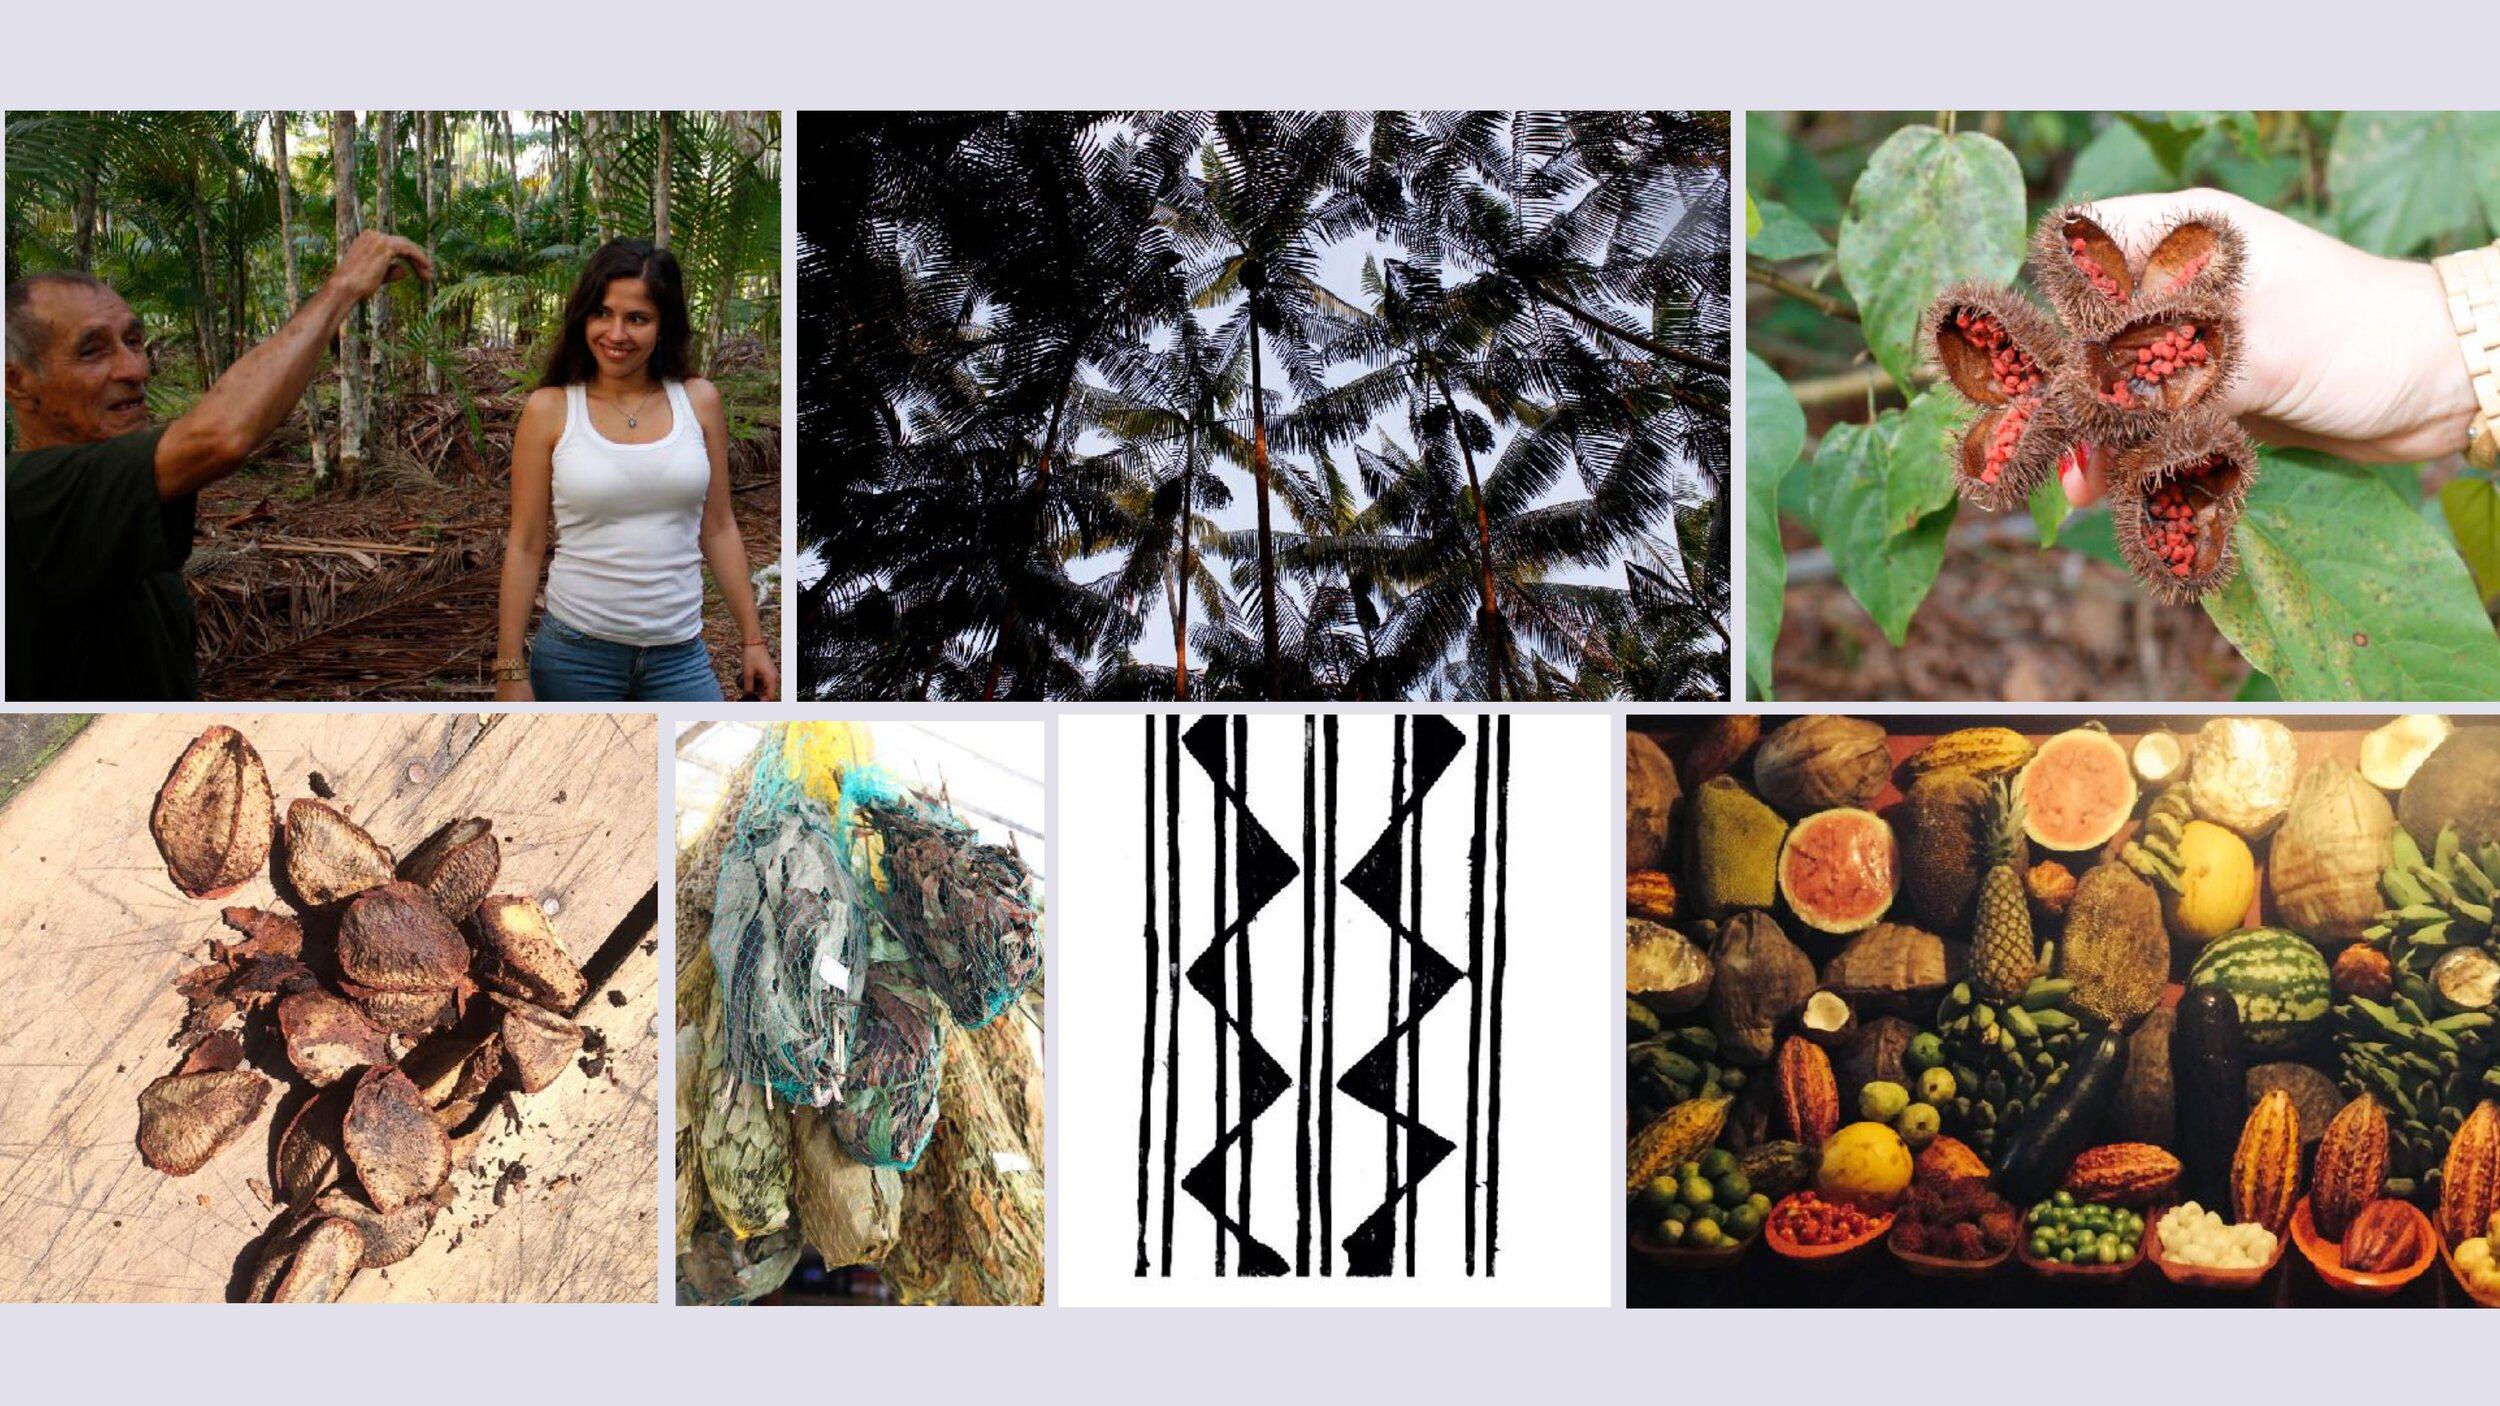 XUA_FantasticForest_AmazonStory.jpg